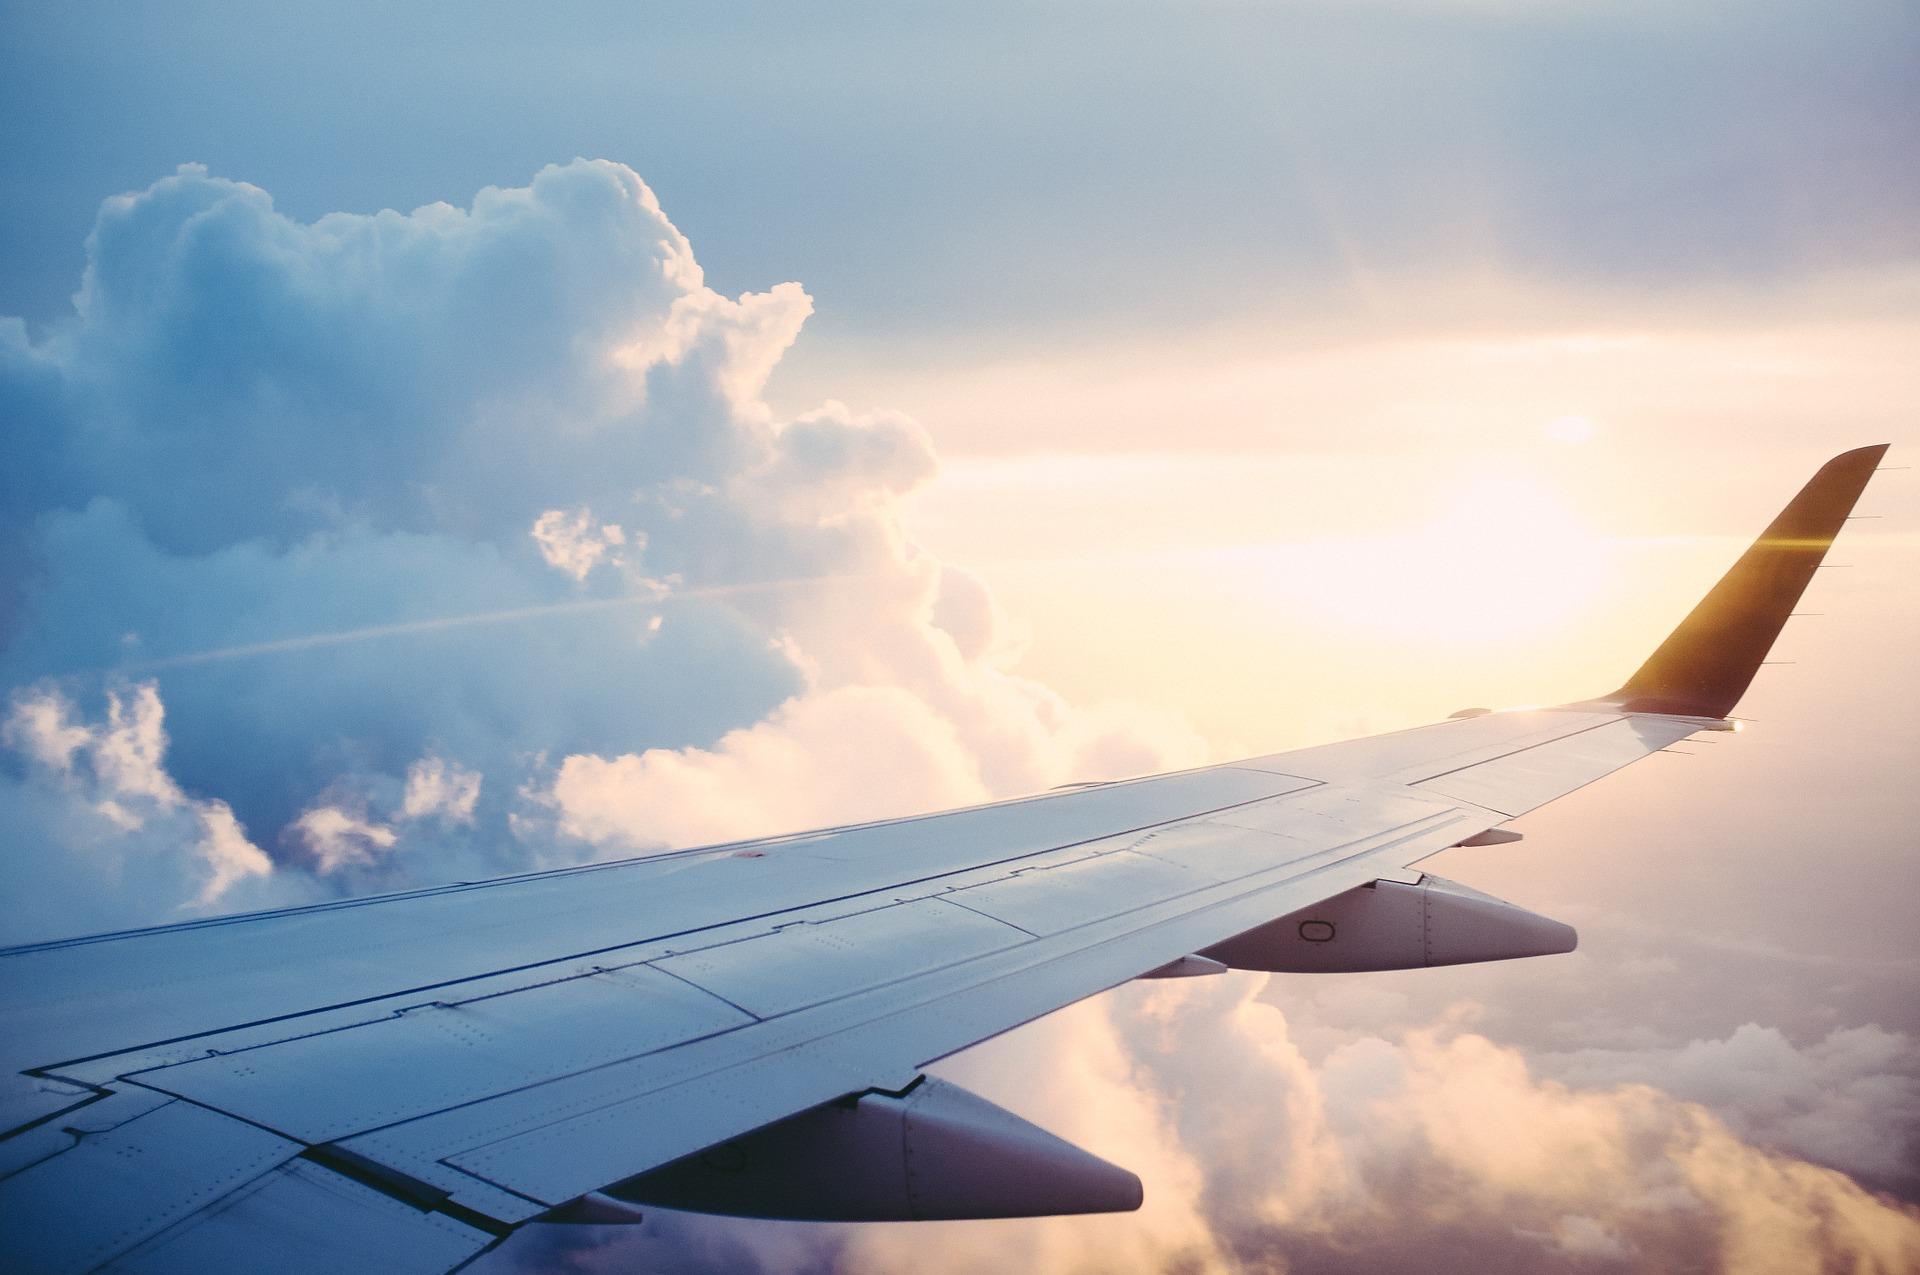 aerospace industry: fibreglass